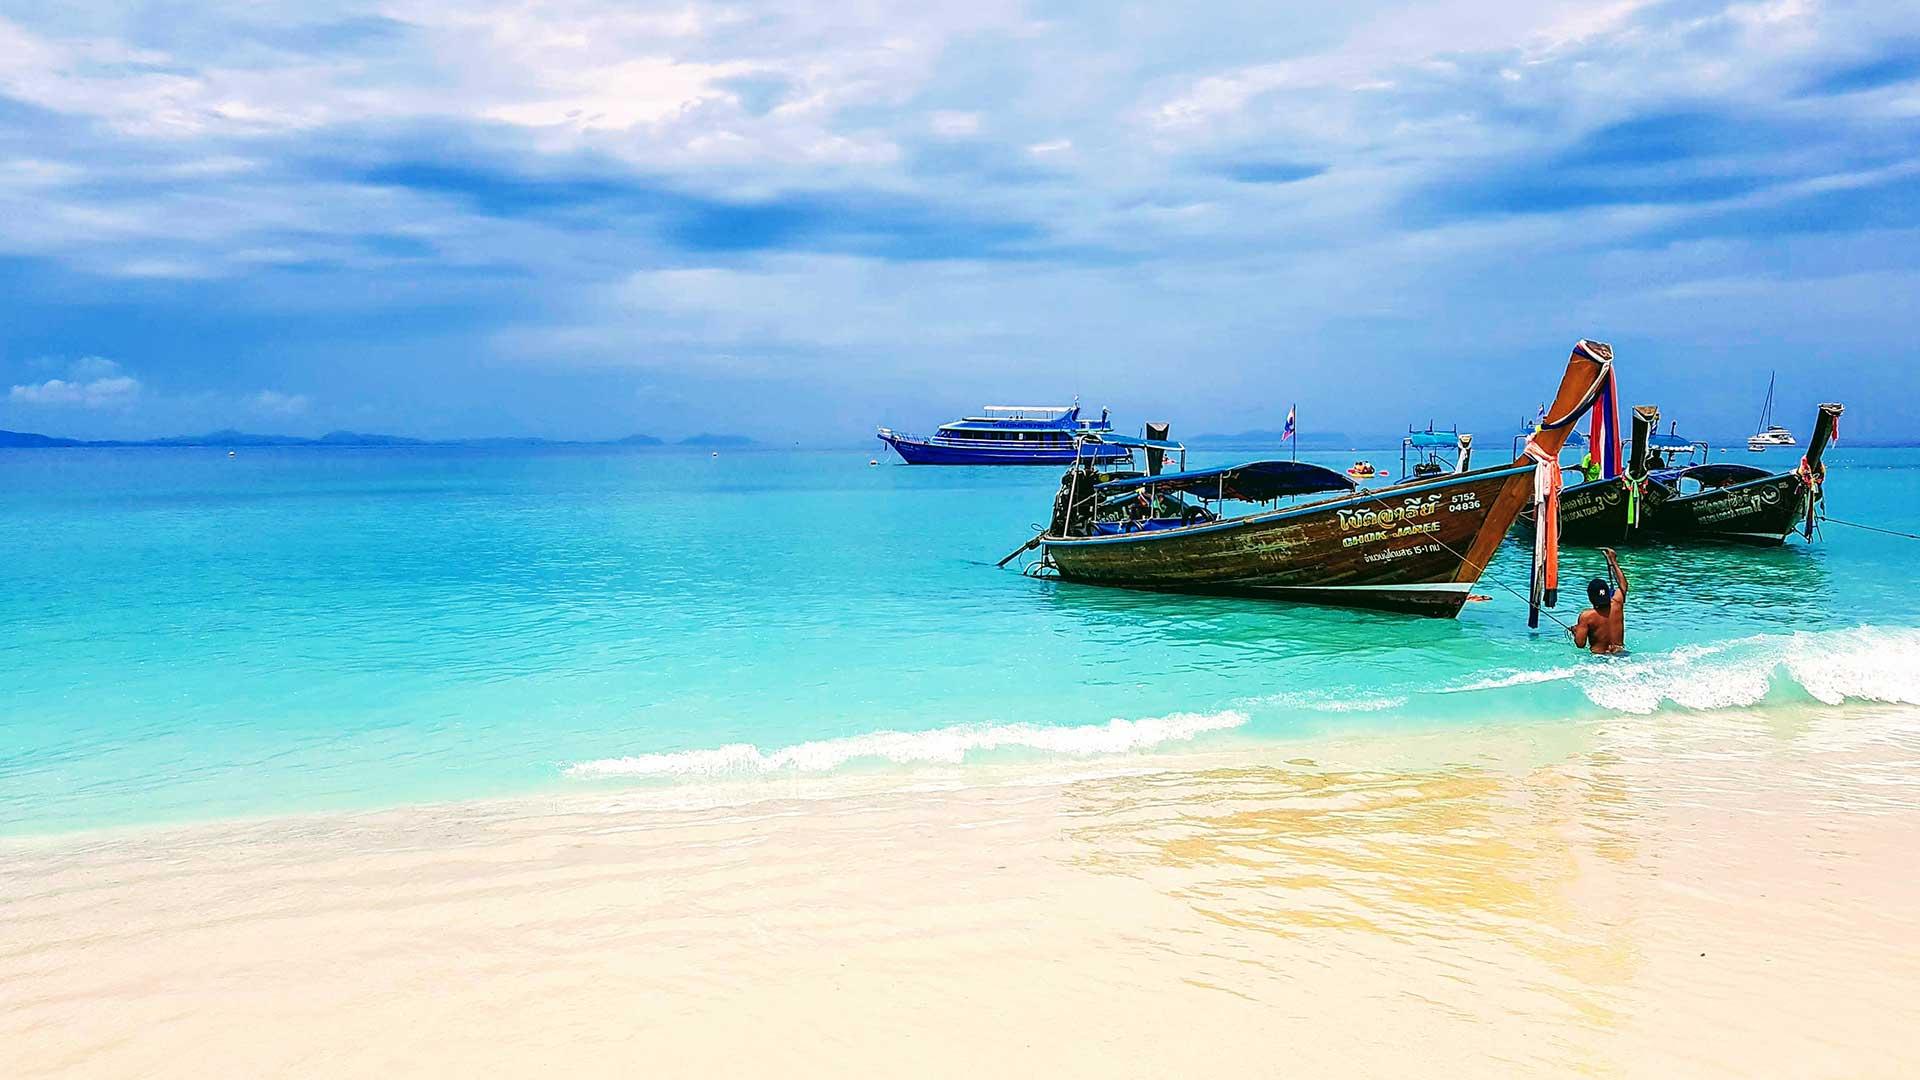 Пхукет, Таиланд (Андаманское Море)